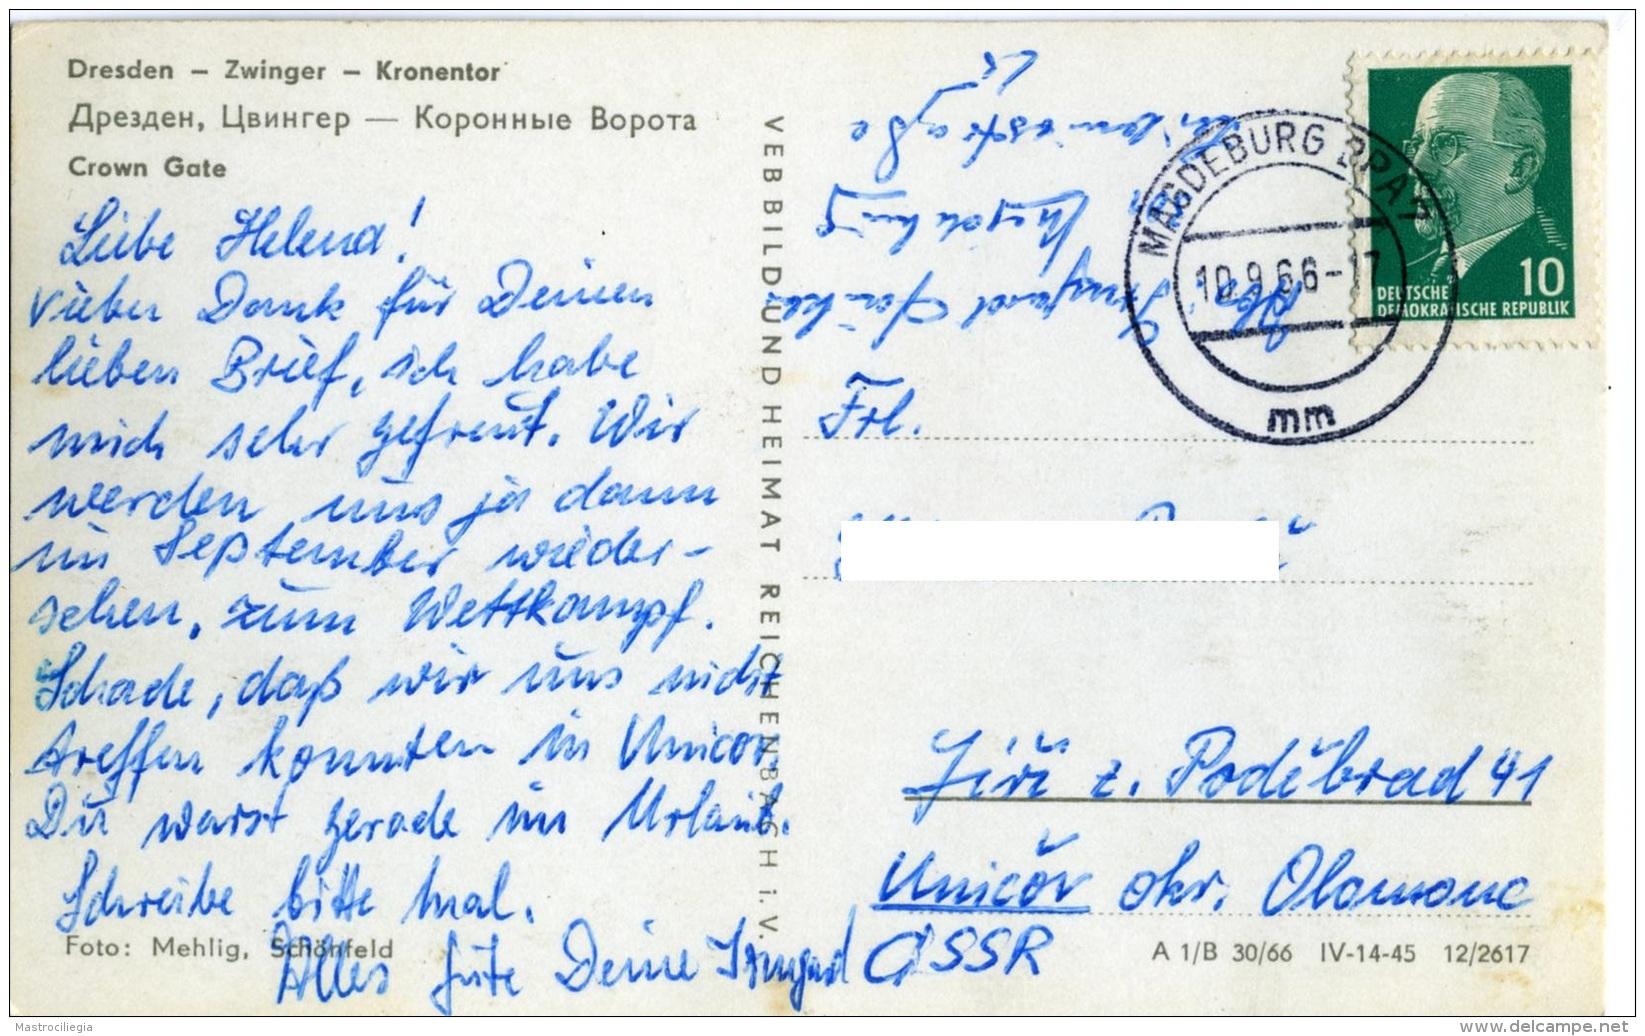 GERMANIA  SACHSEN   DRESDEN  Zwinger  Kronentor - Dresden